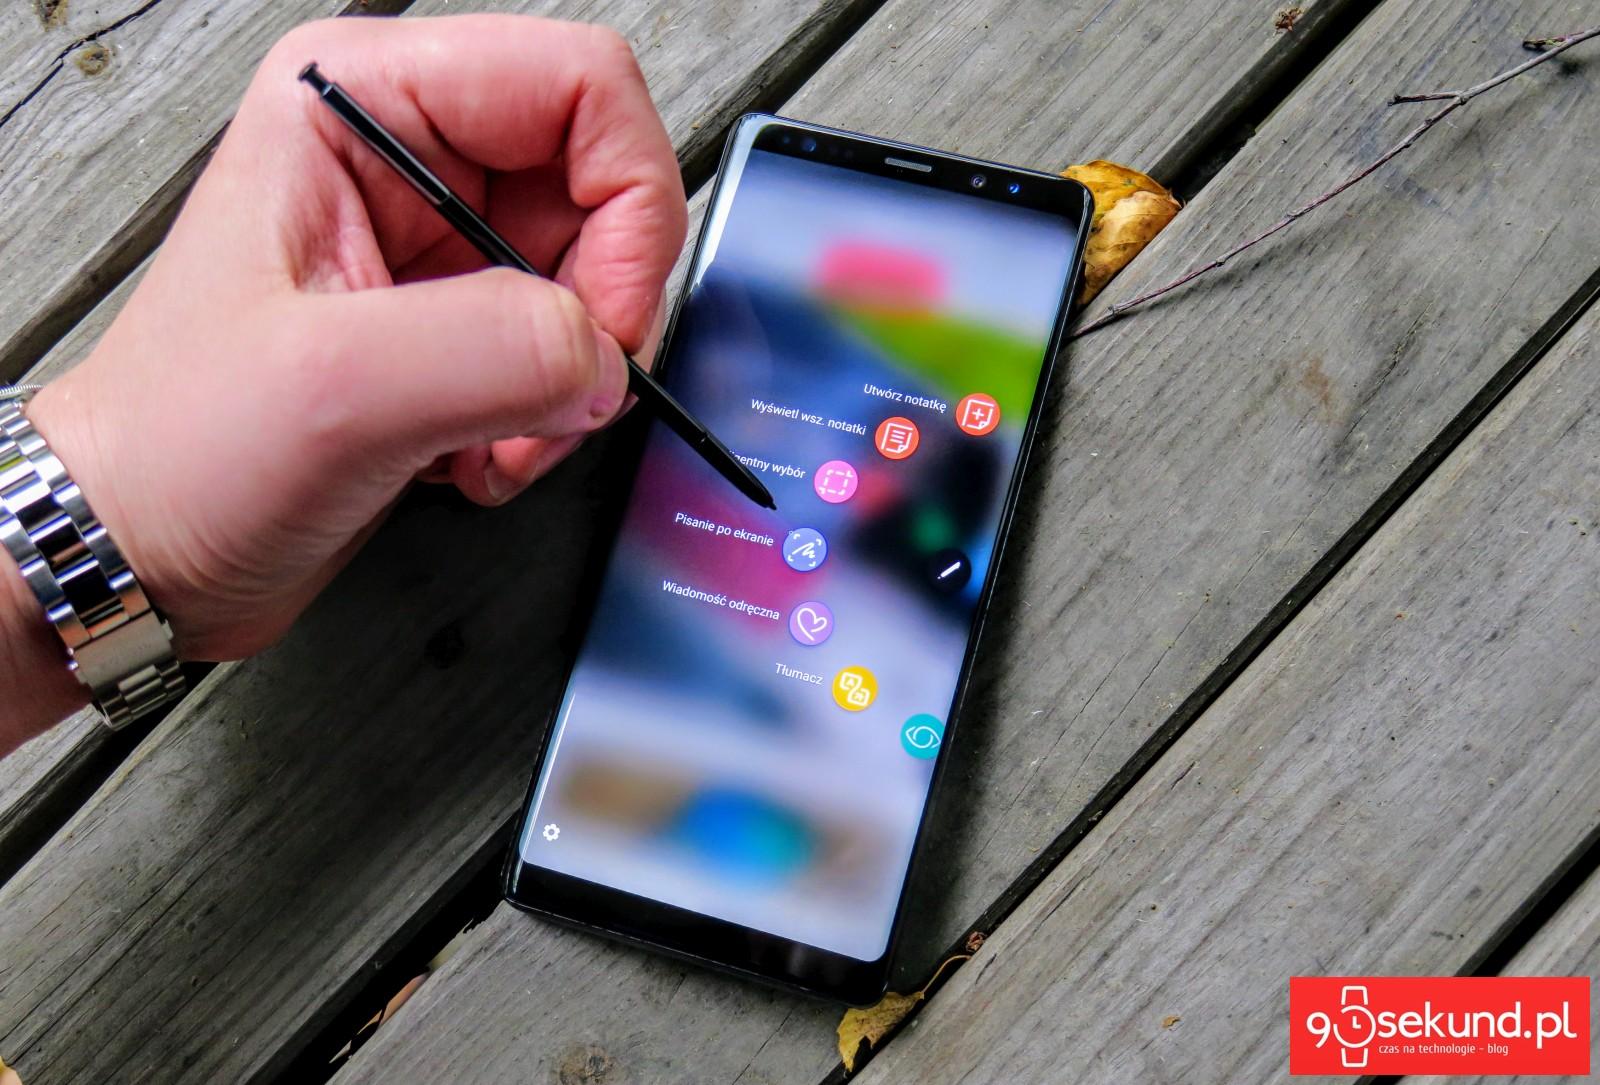 Samsunga Galaxy Note8 (SM-N950F) - 90sekund.pl